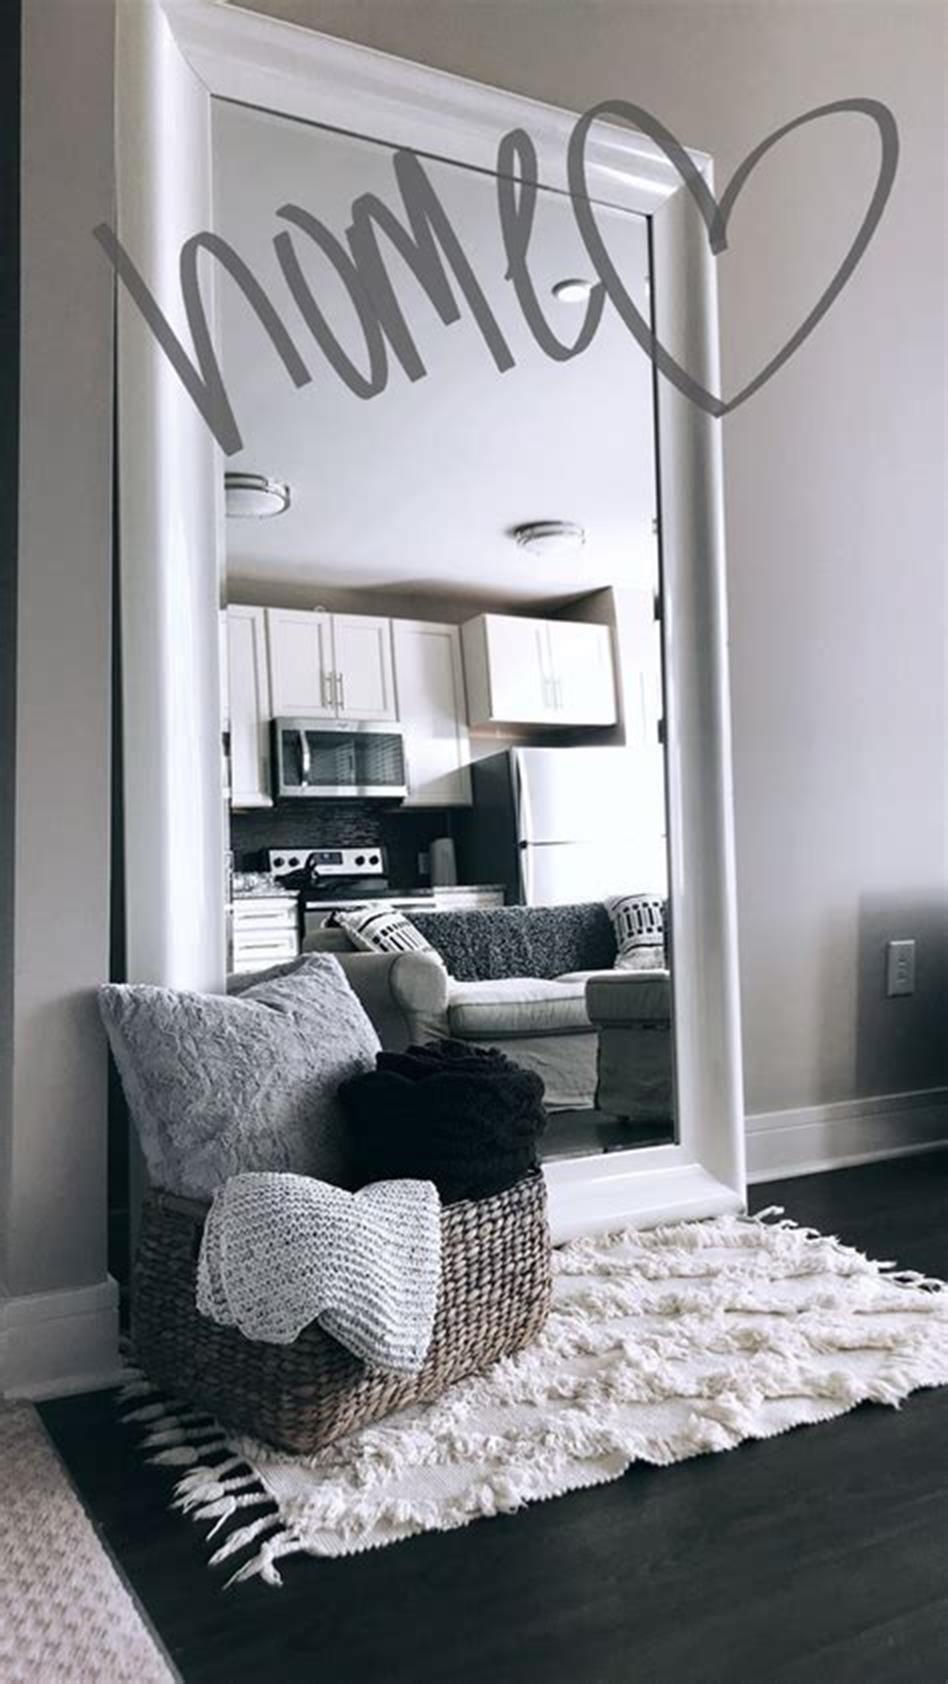 40 Cozy Minimalist Bedroom Decorating Ideas In 2019 9 In 2020